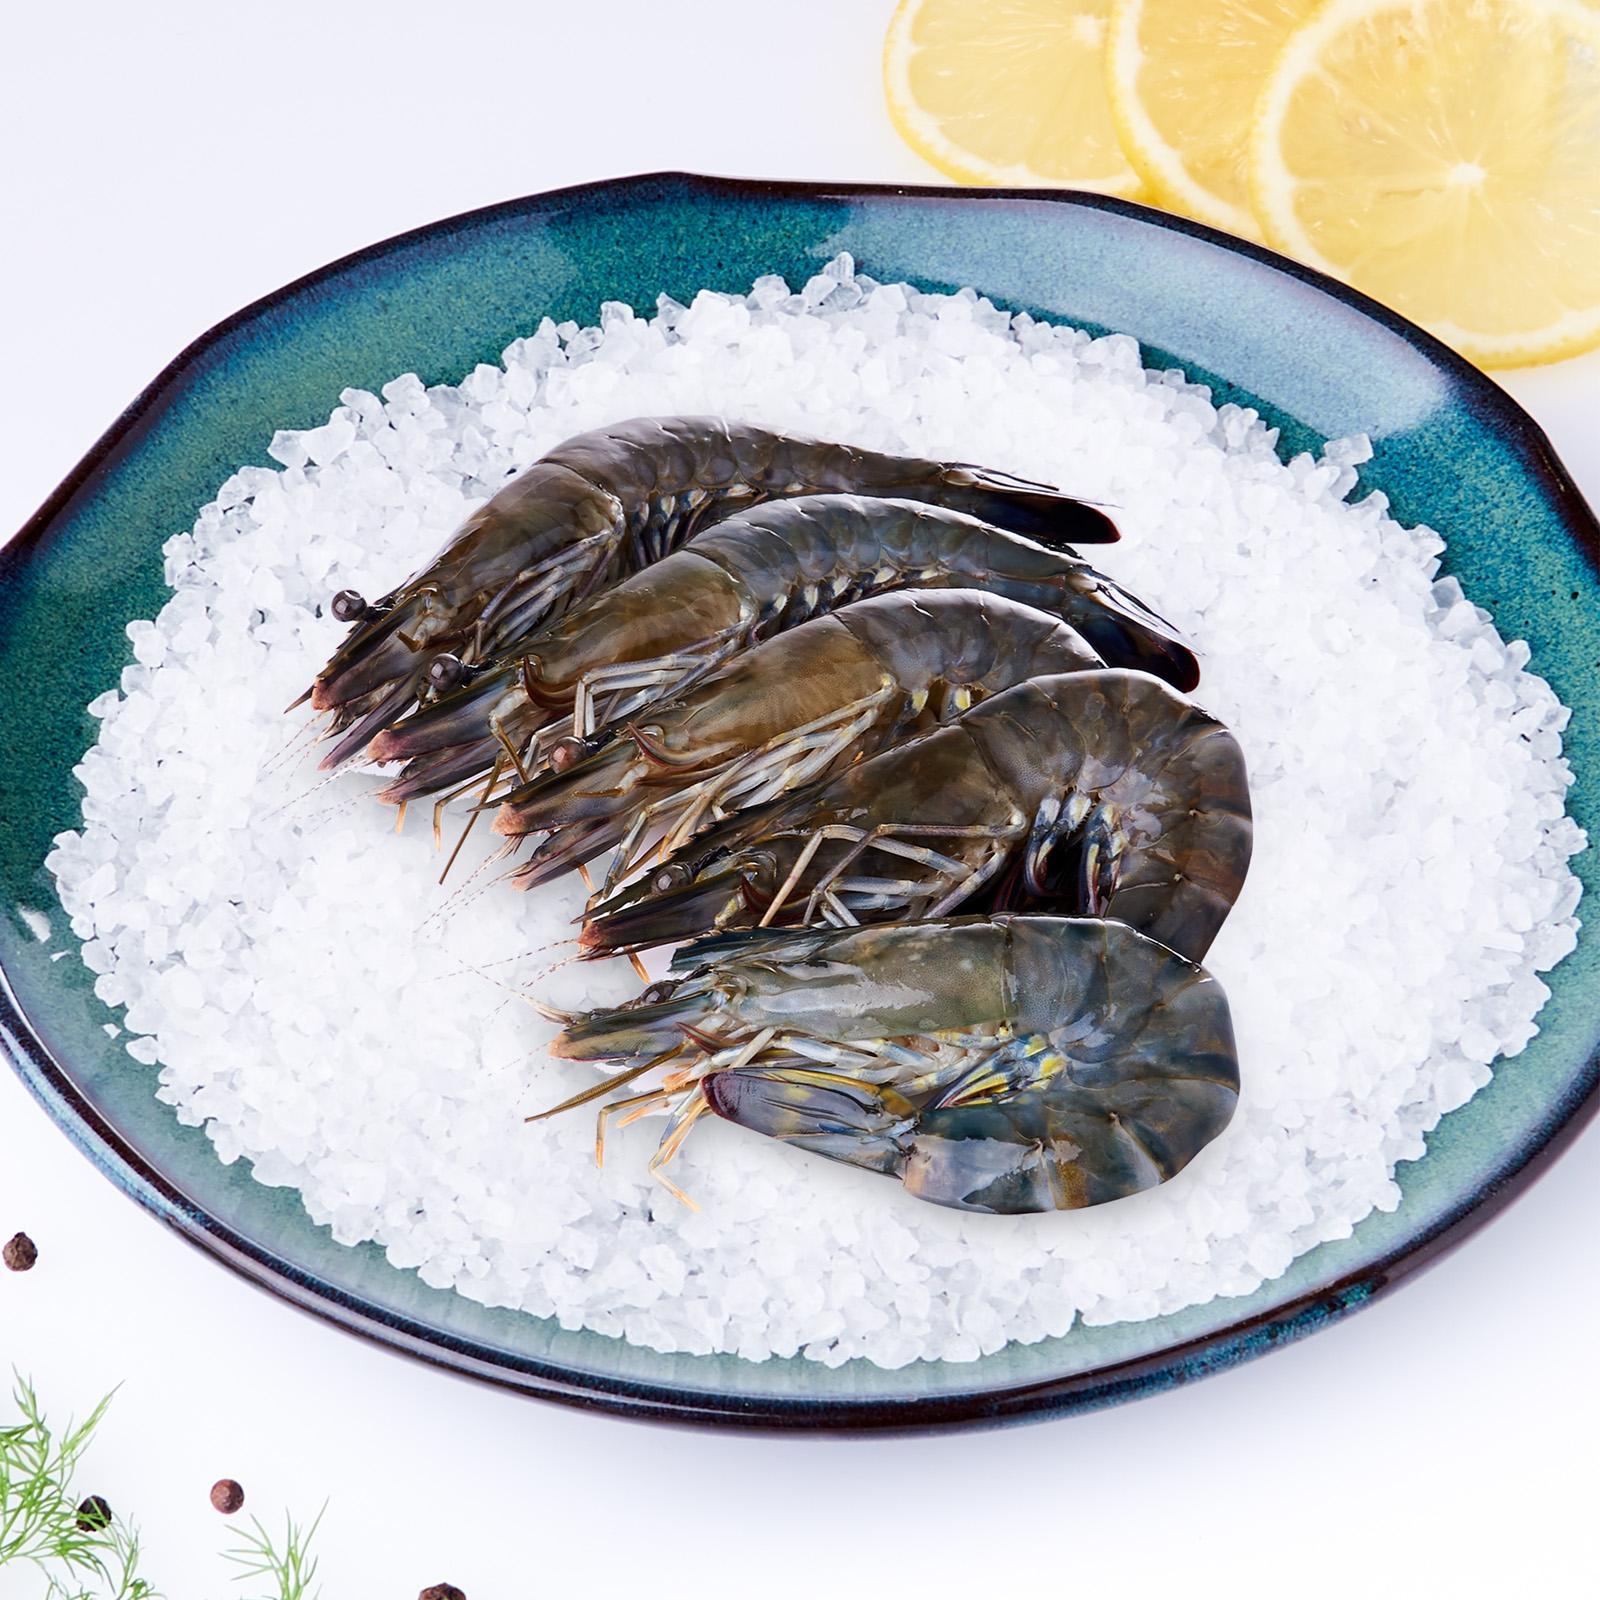 Jurong Fish Market Fresh Tiger Prawns - Medium